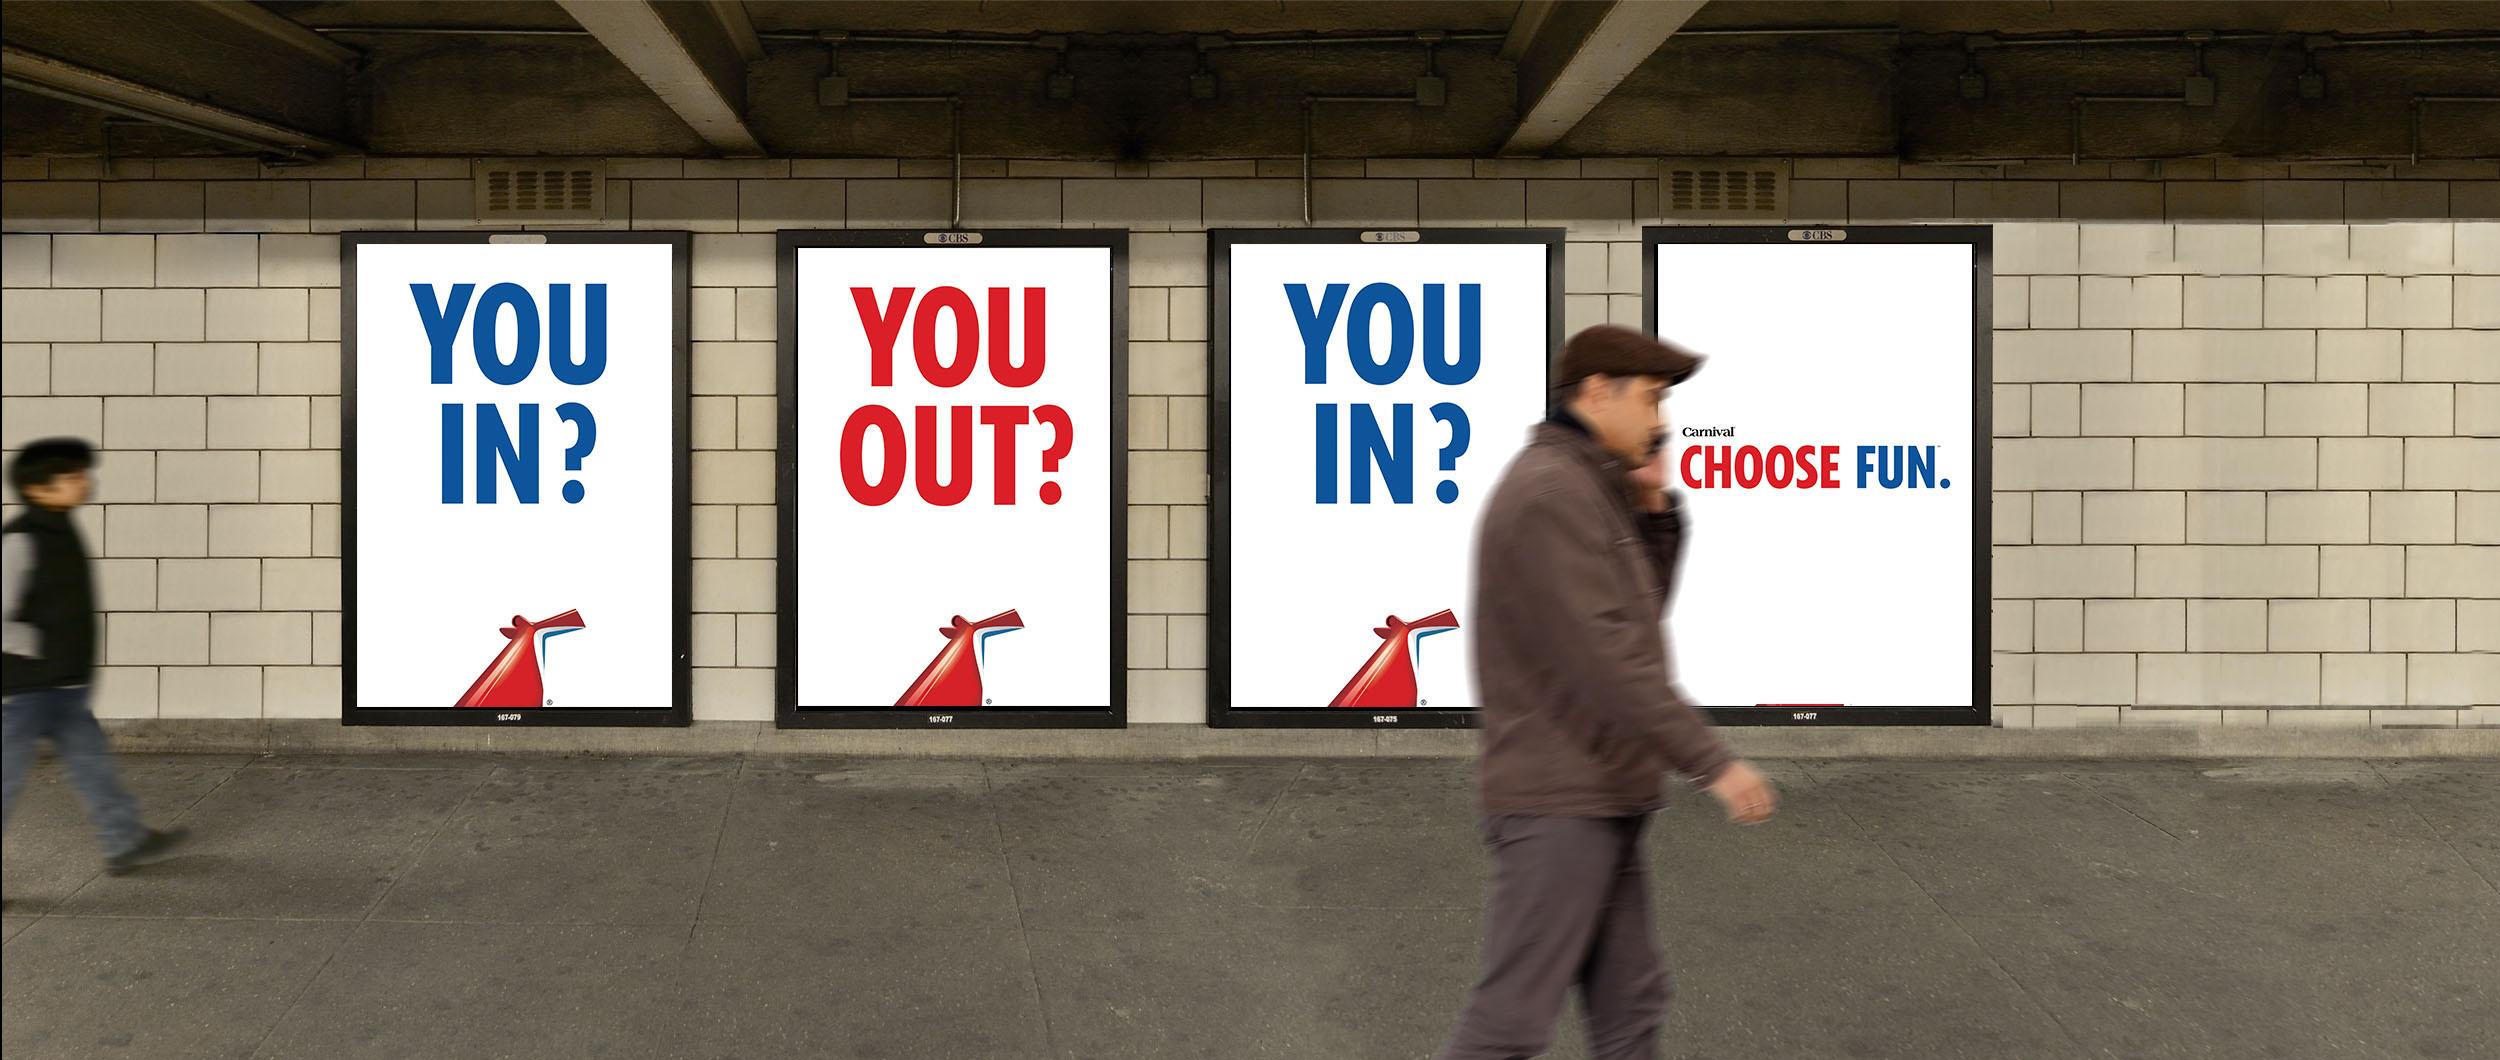 carnival_subway ads_4 pannel.jpg